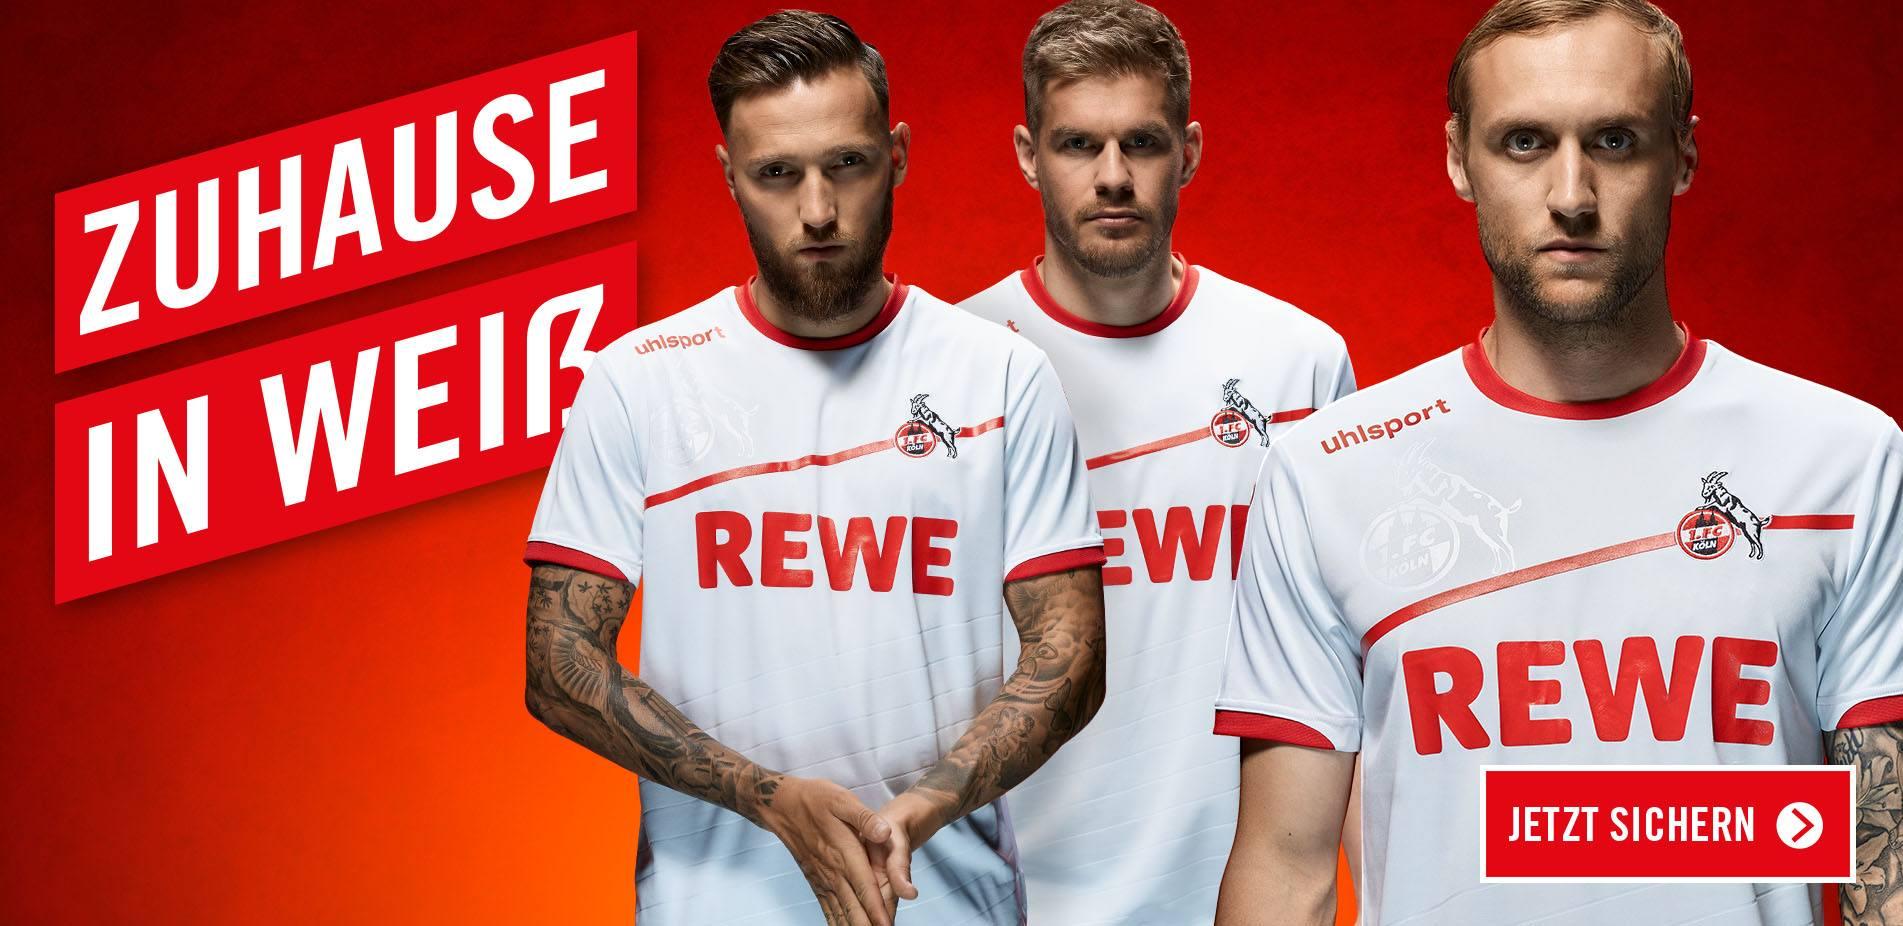 Das neue Heimtrikot des 1. FC Köln 2018/2019